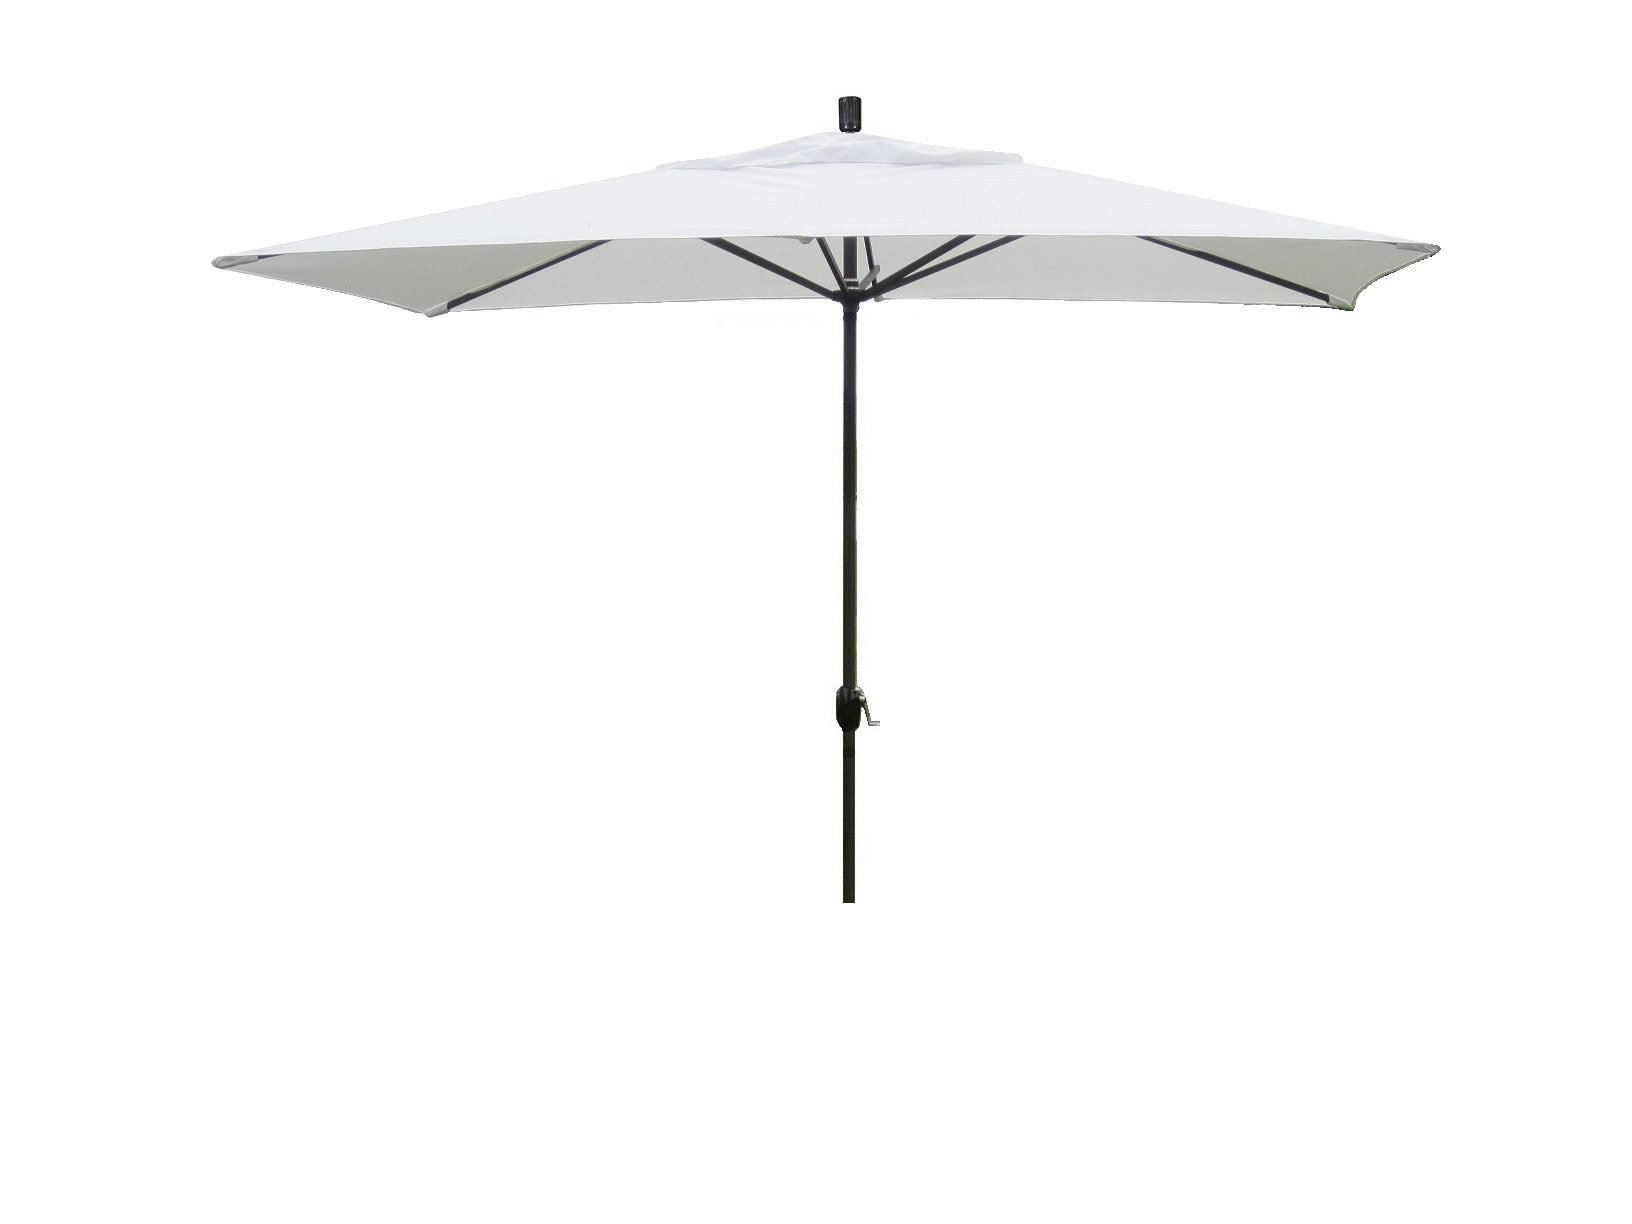 Current Fordbridge Rectangular Market Umbrellas With Regard To Northfleet 10' X 6' Rectangular Market Umbrella (View 6 of 20)